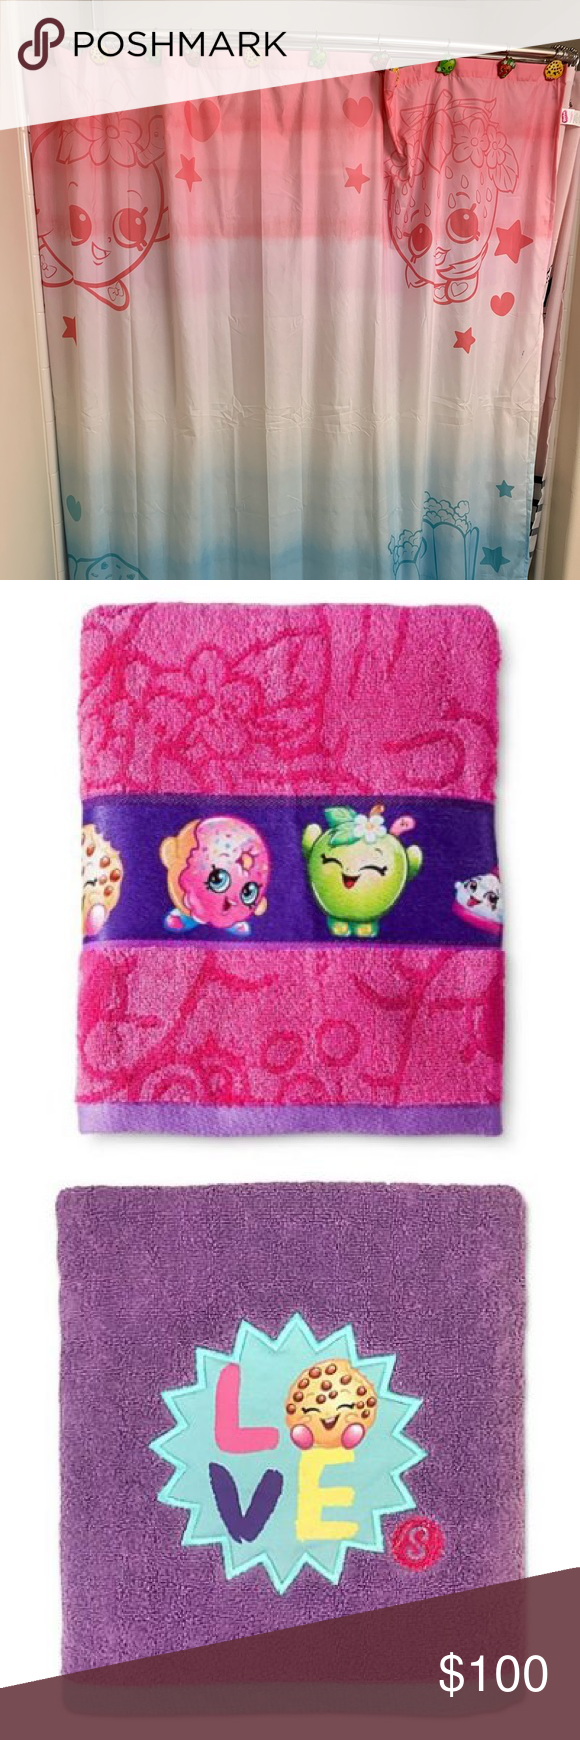 Shopkins Bath Set Curtain Towel Rings Rug Trash Shopkins Bathroom